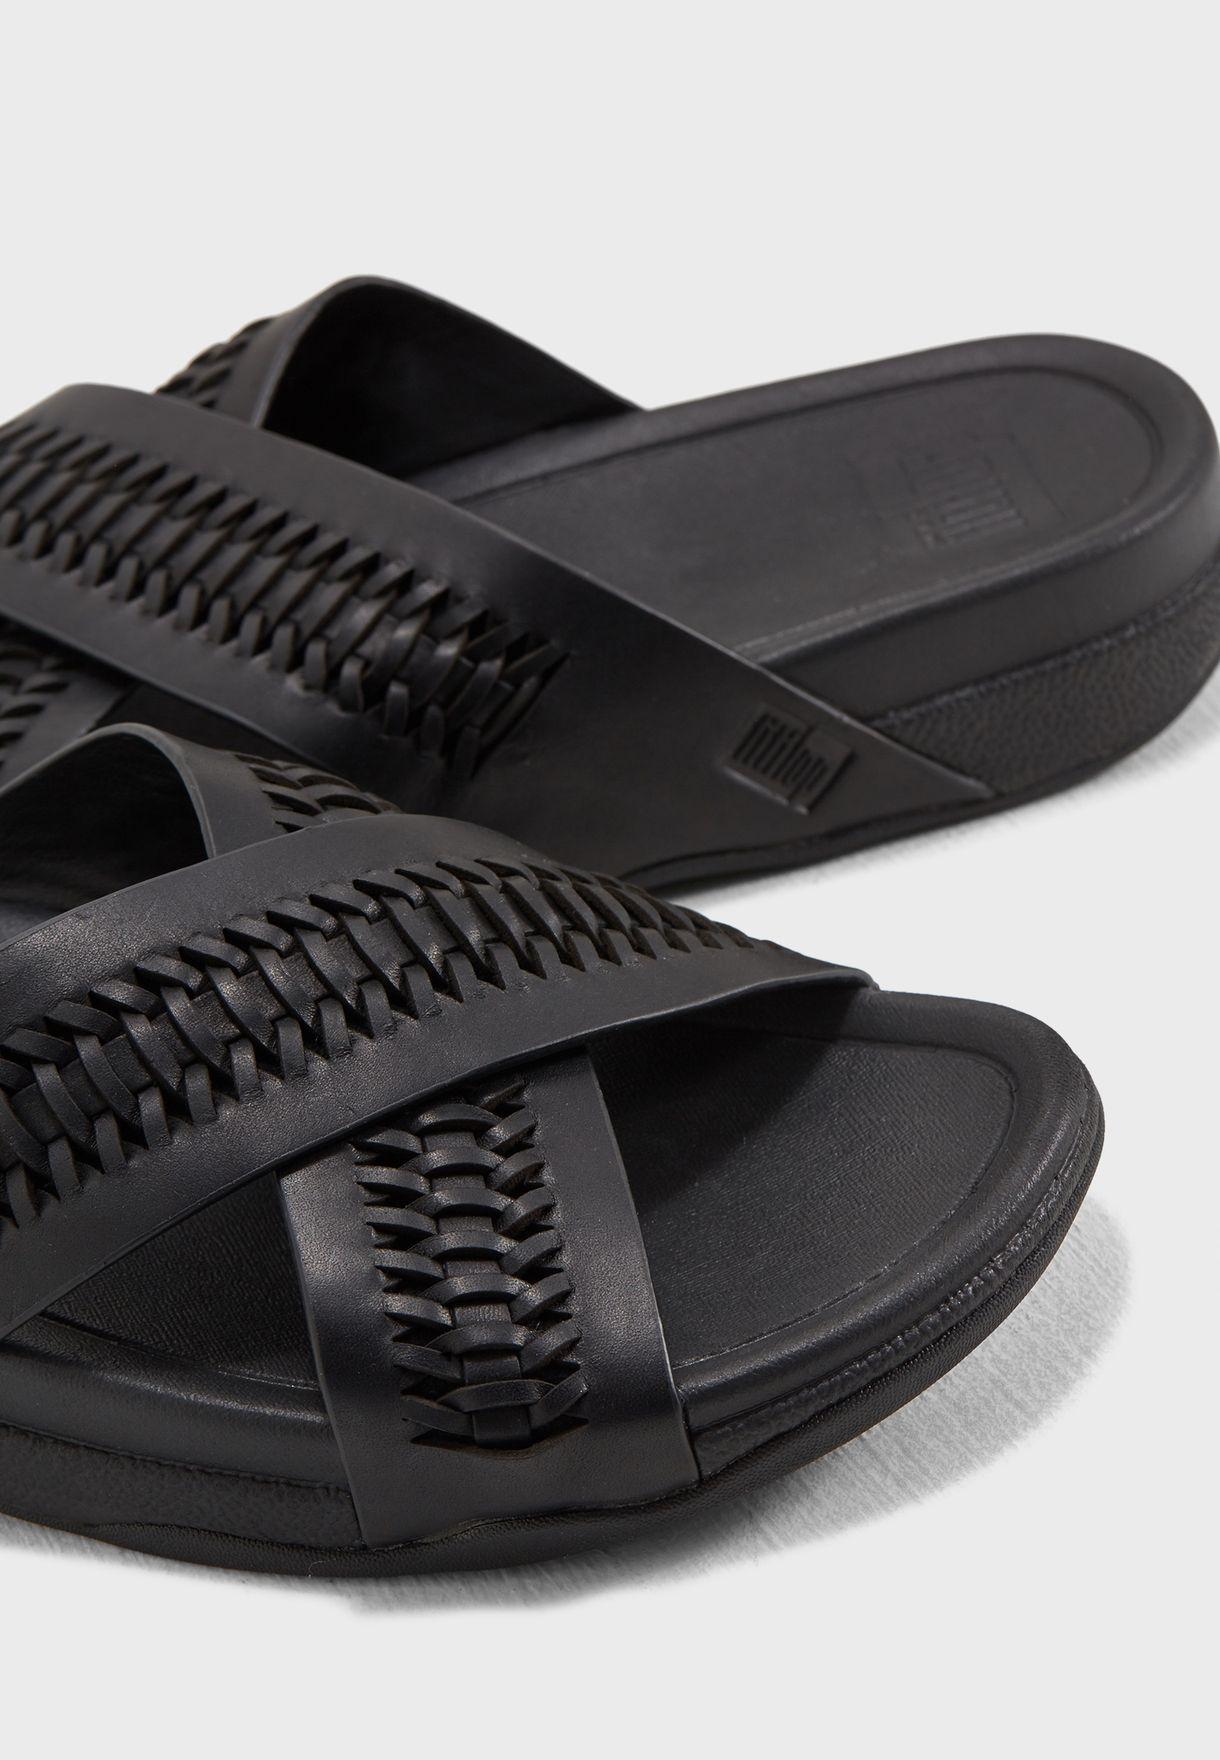 41c184fd5861e1 Shop Fitflop black Surfer Woven Leather Sandals L59-001 for Men in ...